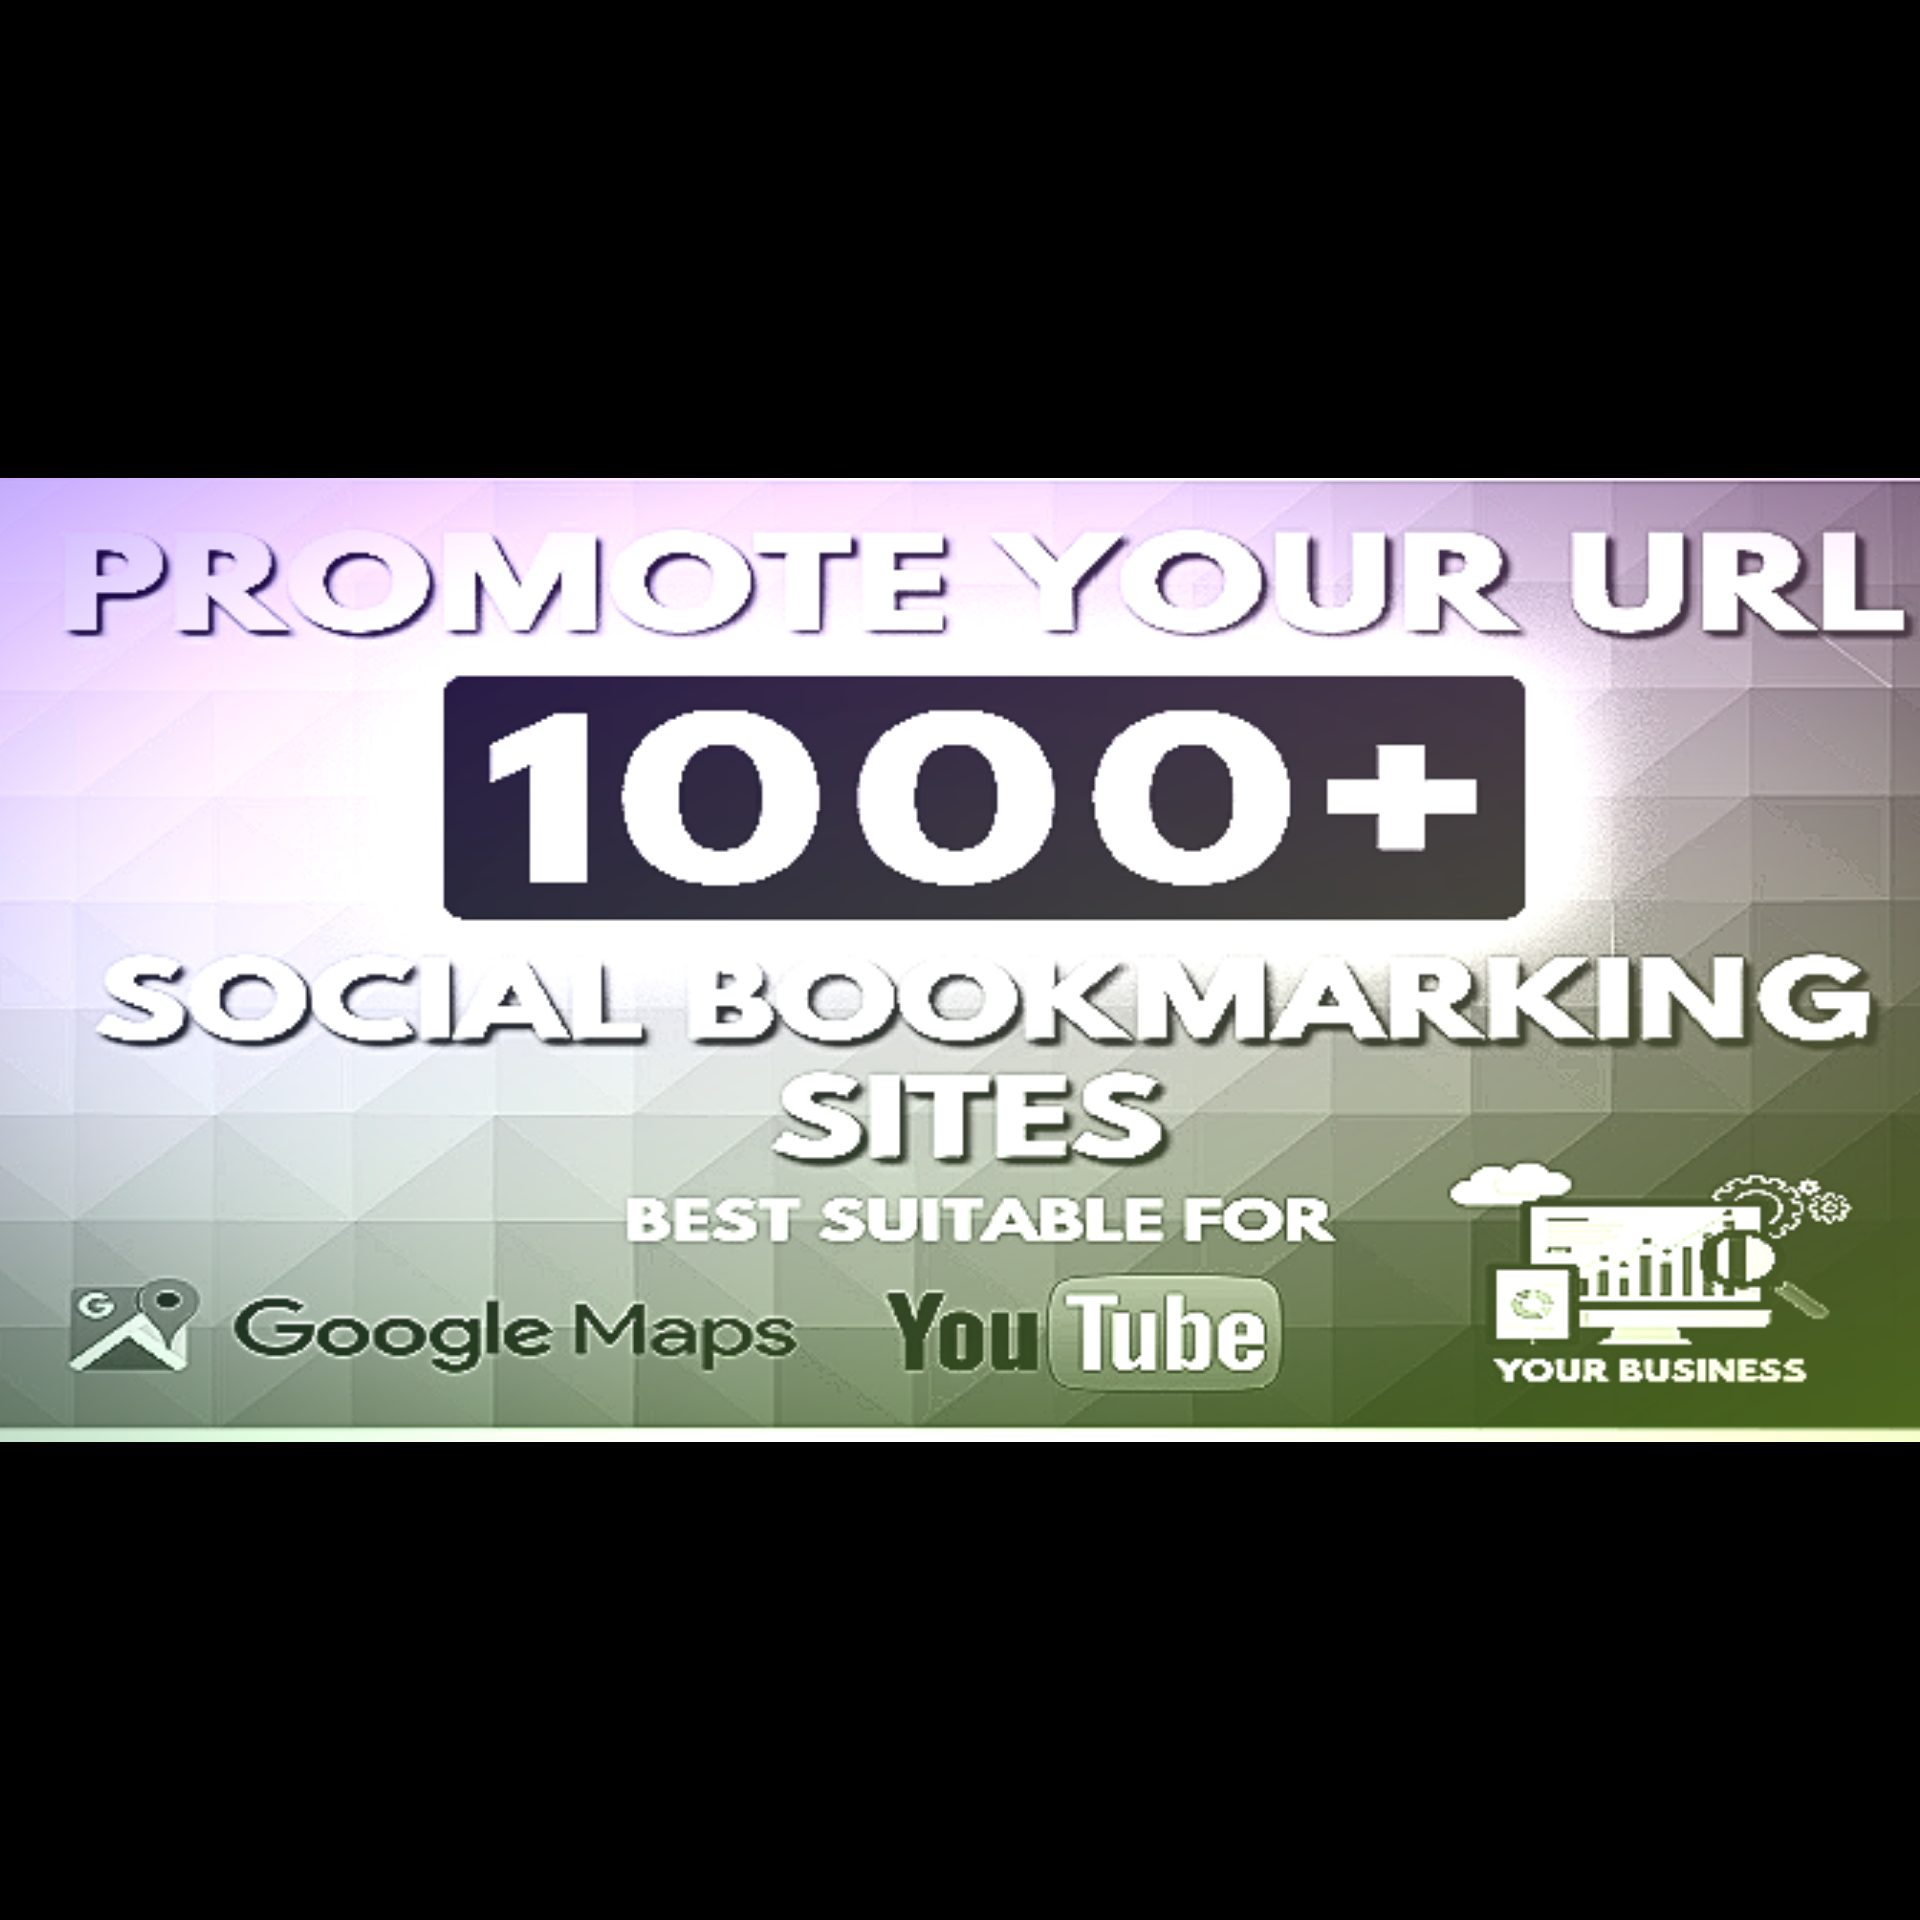 Website Ranking & Social Bookmarking